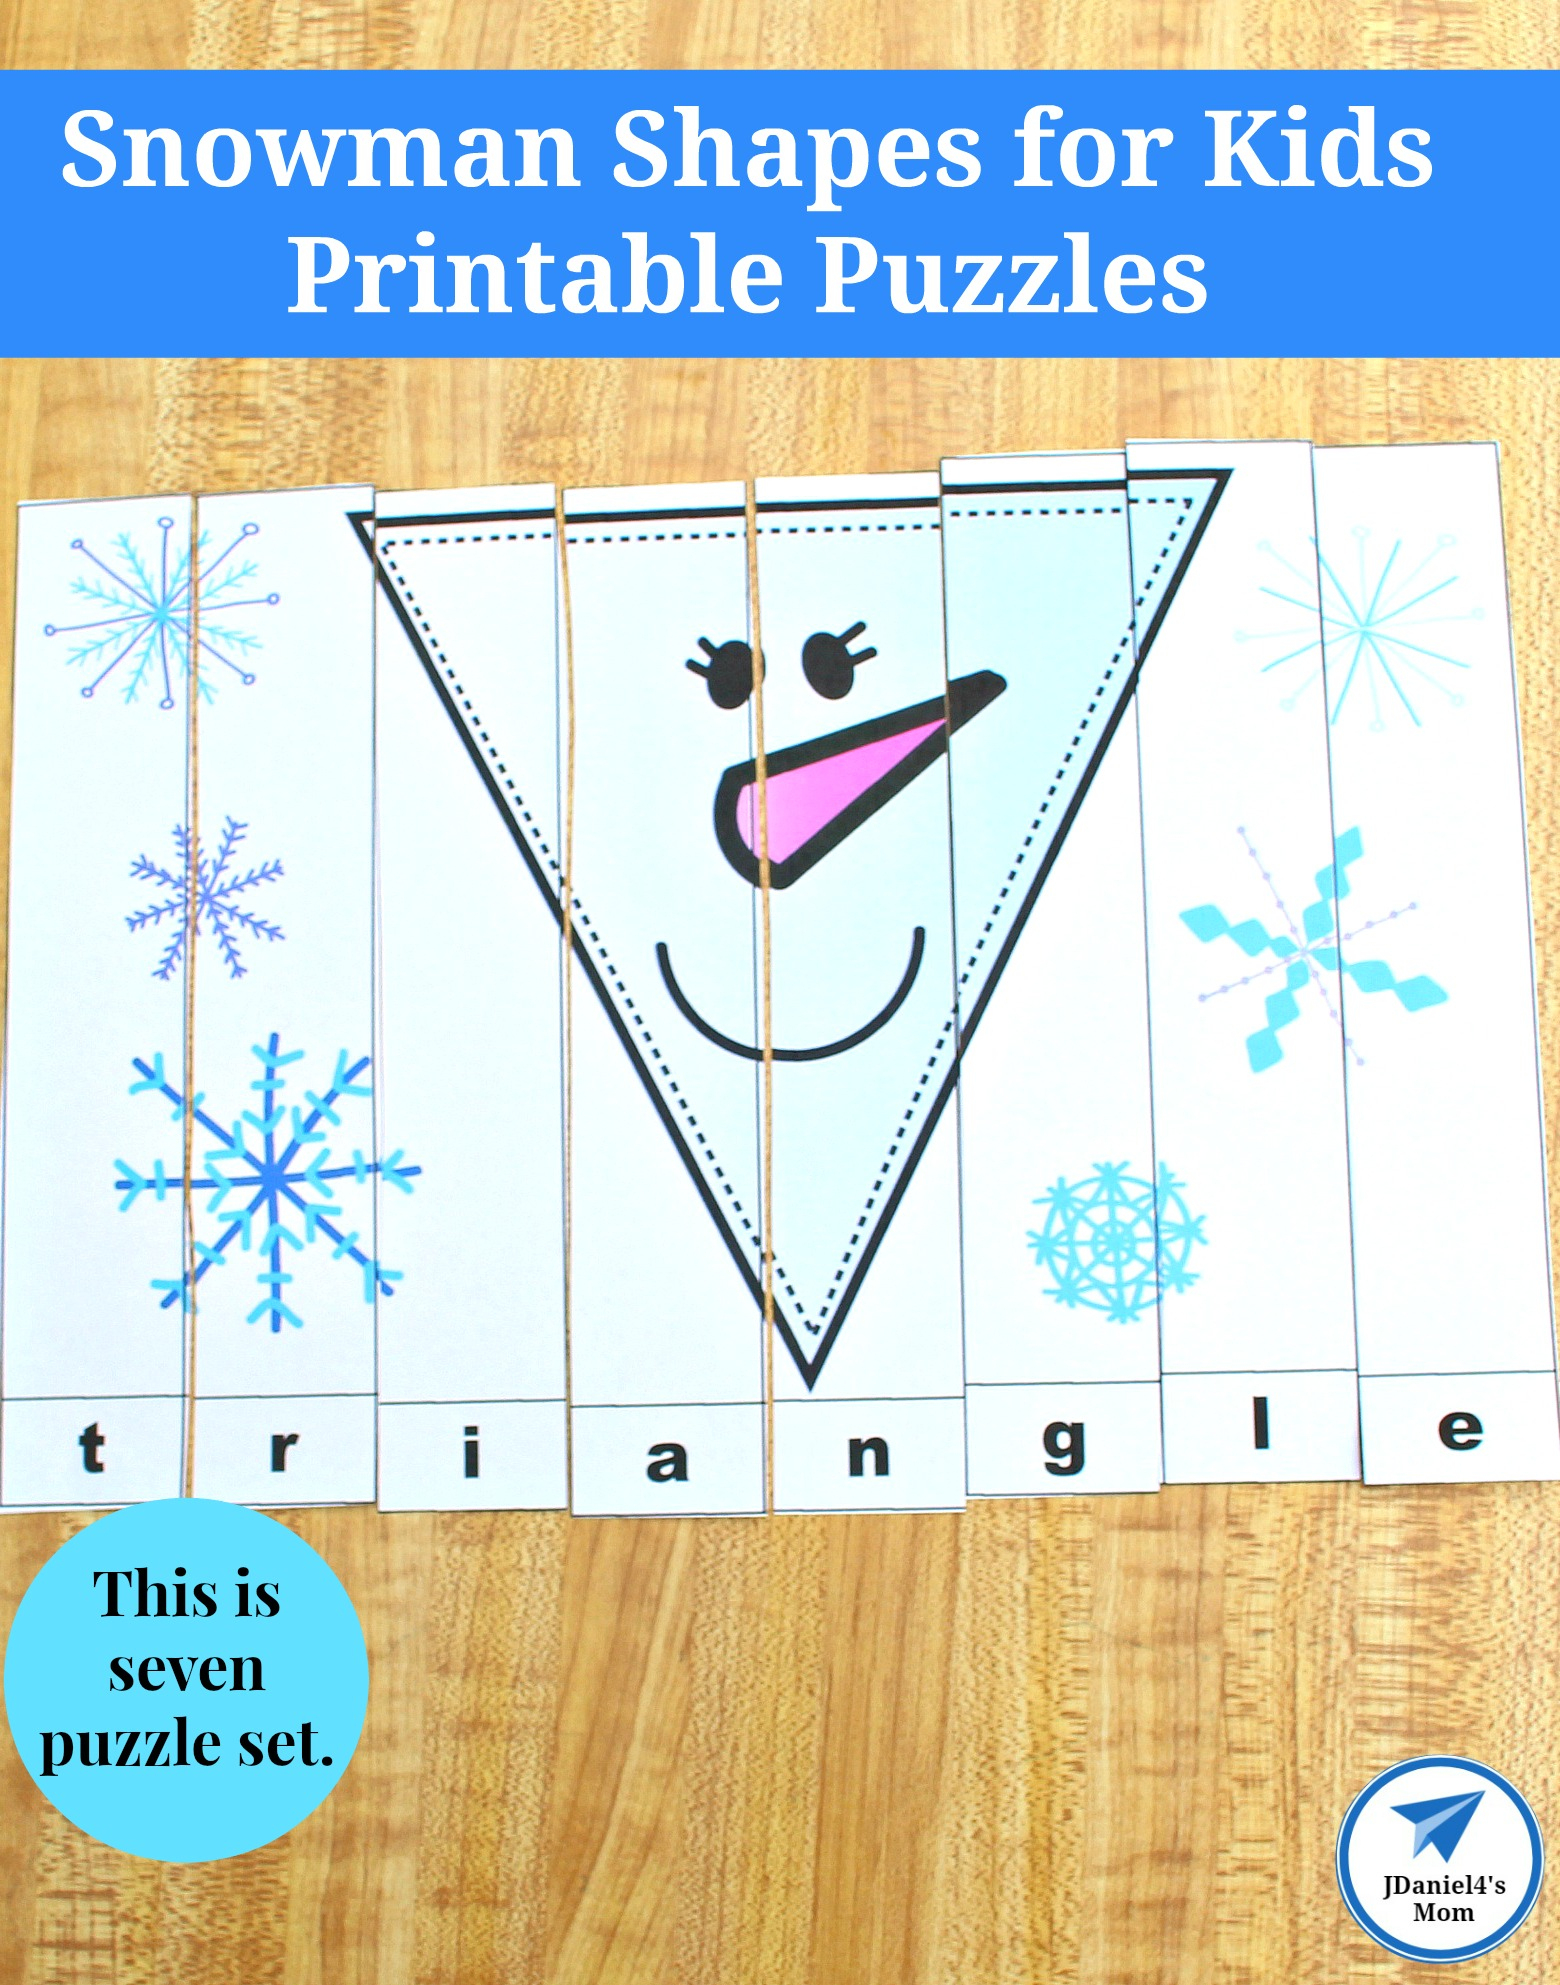 Snowman Shapes For Kids Printable Puzzles - Jdaniel4S Mom - Printable Floor Puzzle